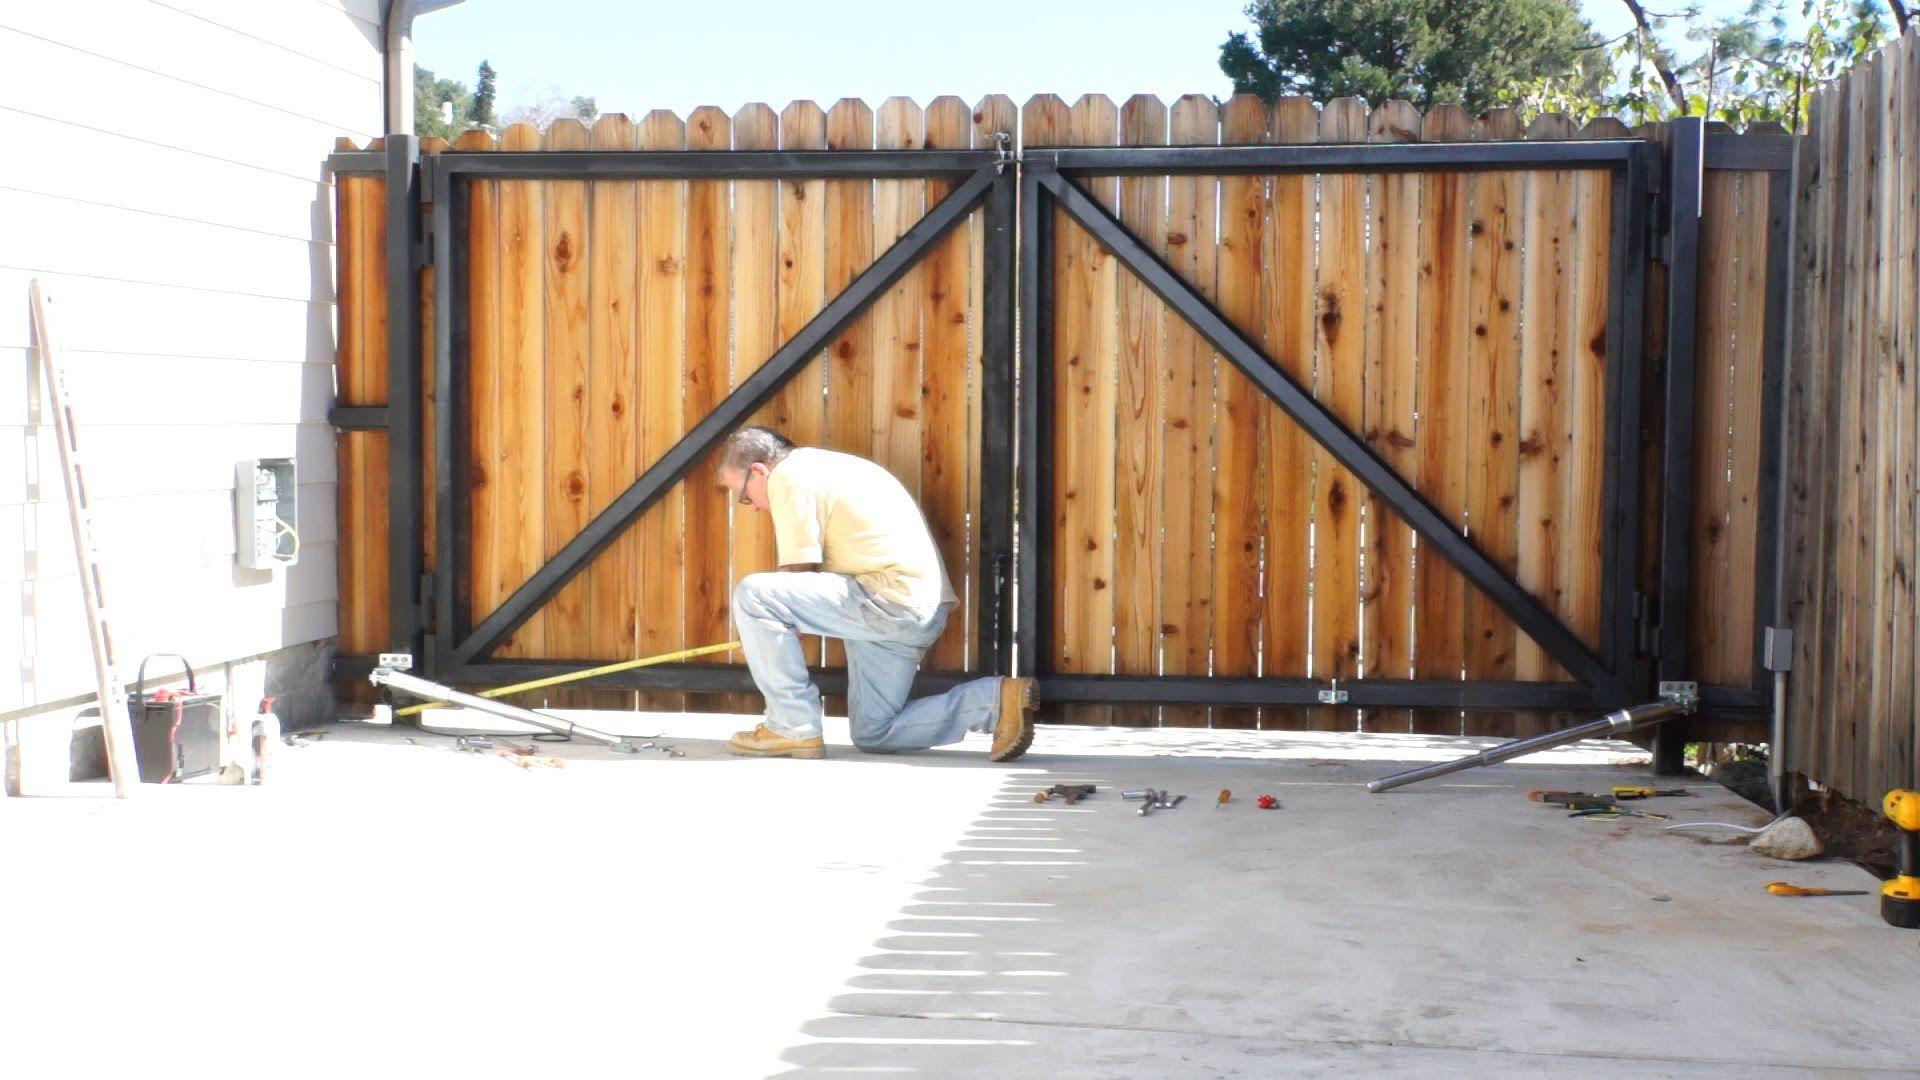 E8 300mm Dual Swing Gate Opener Installation Swing Gate Opener Driveway Gate Yard Gate